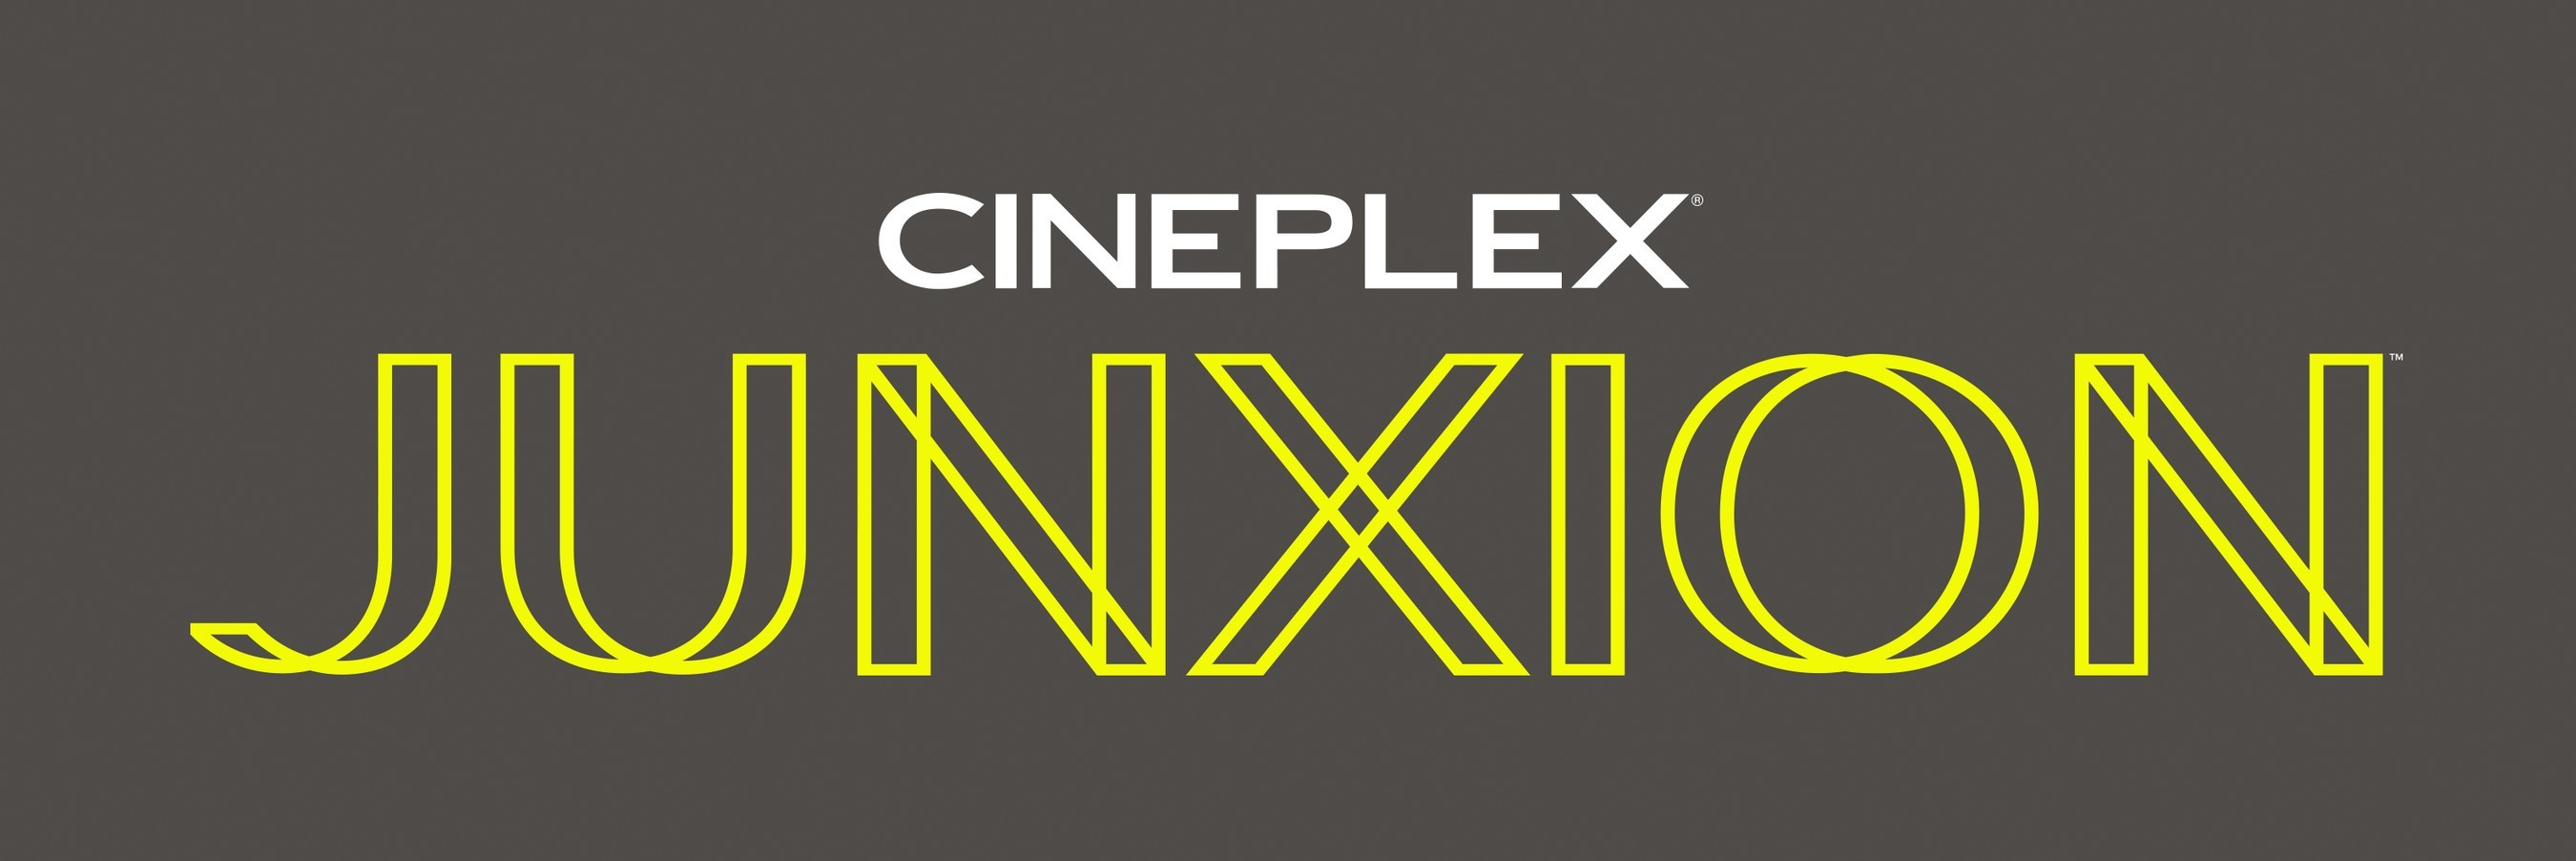 Introducing the Cinema of the Future: Cineplex Announces Junxion